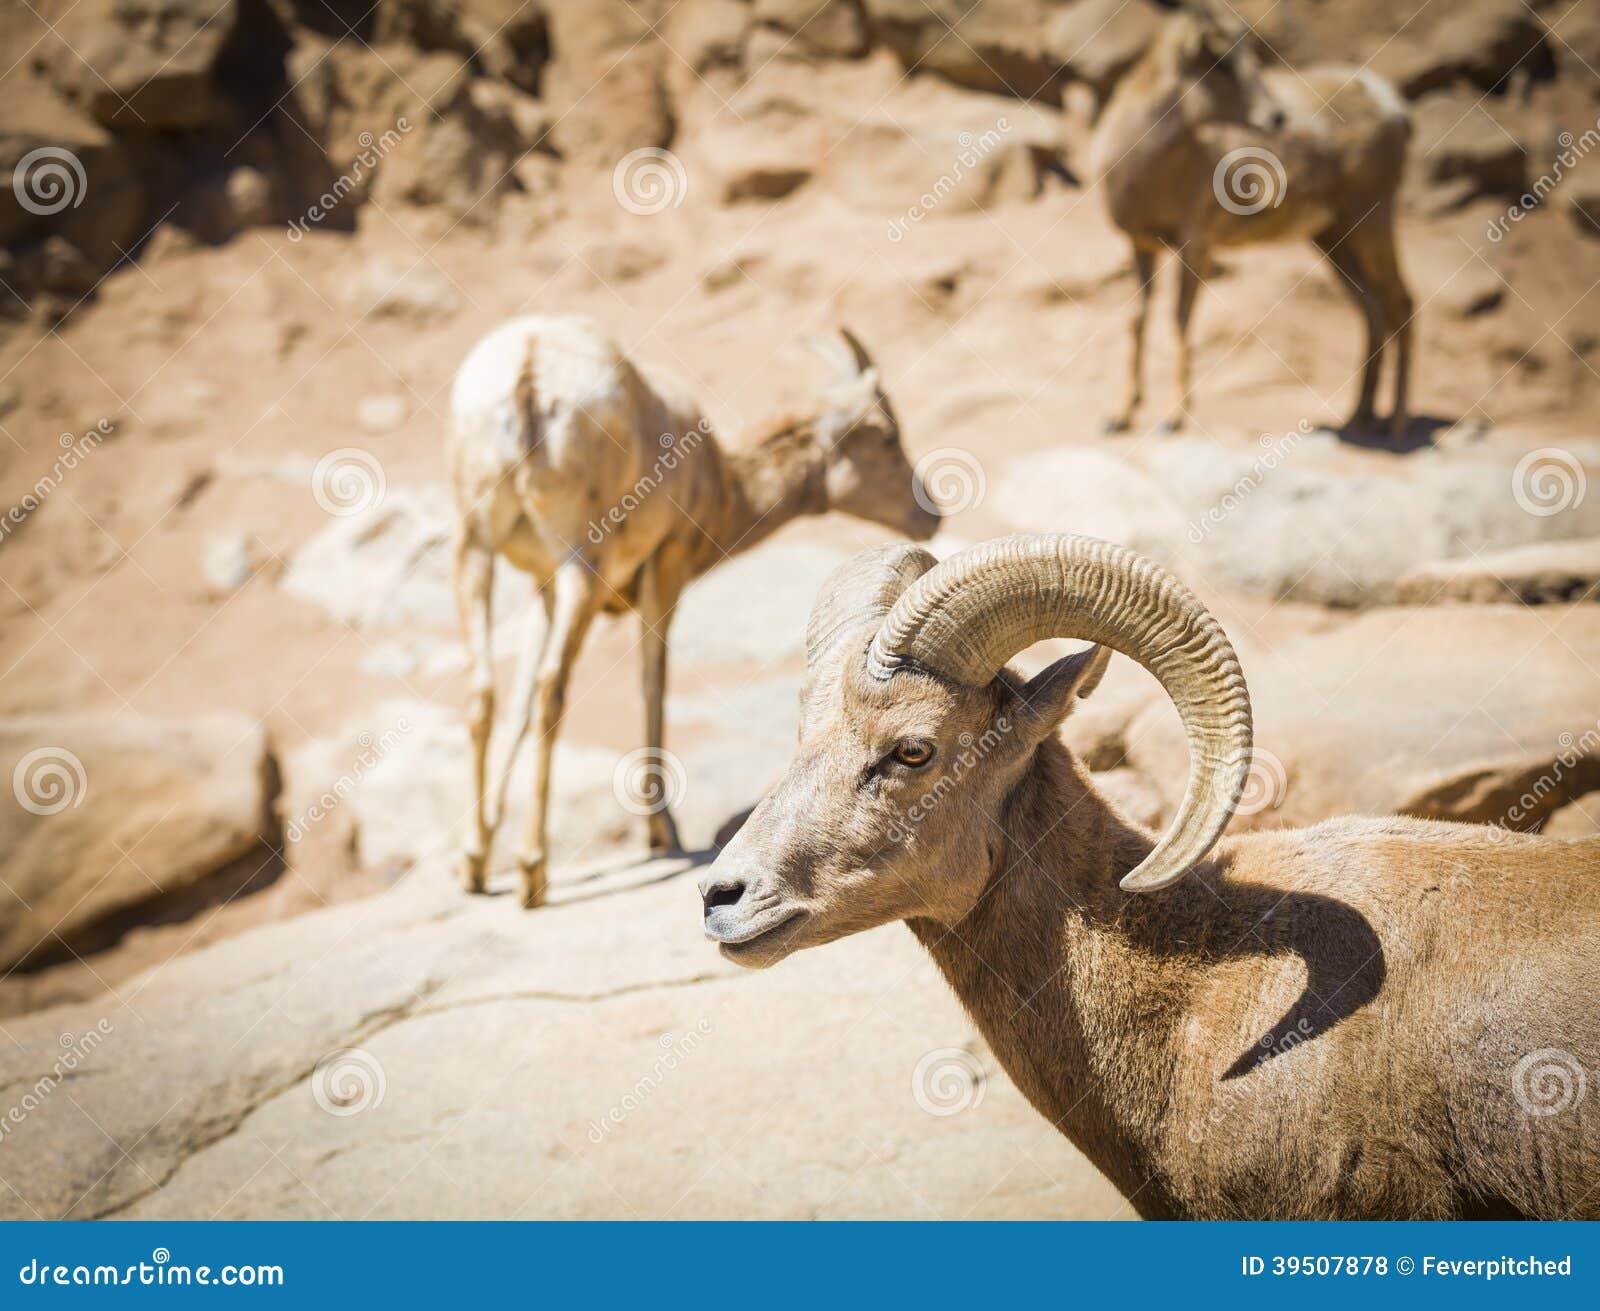 Heard of Desert Bighorn Sheep